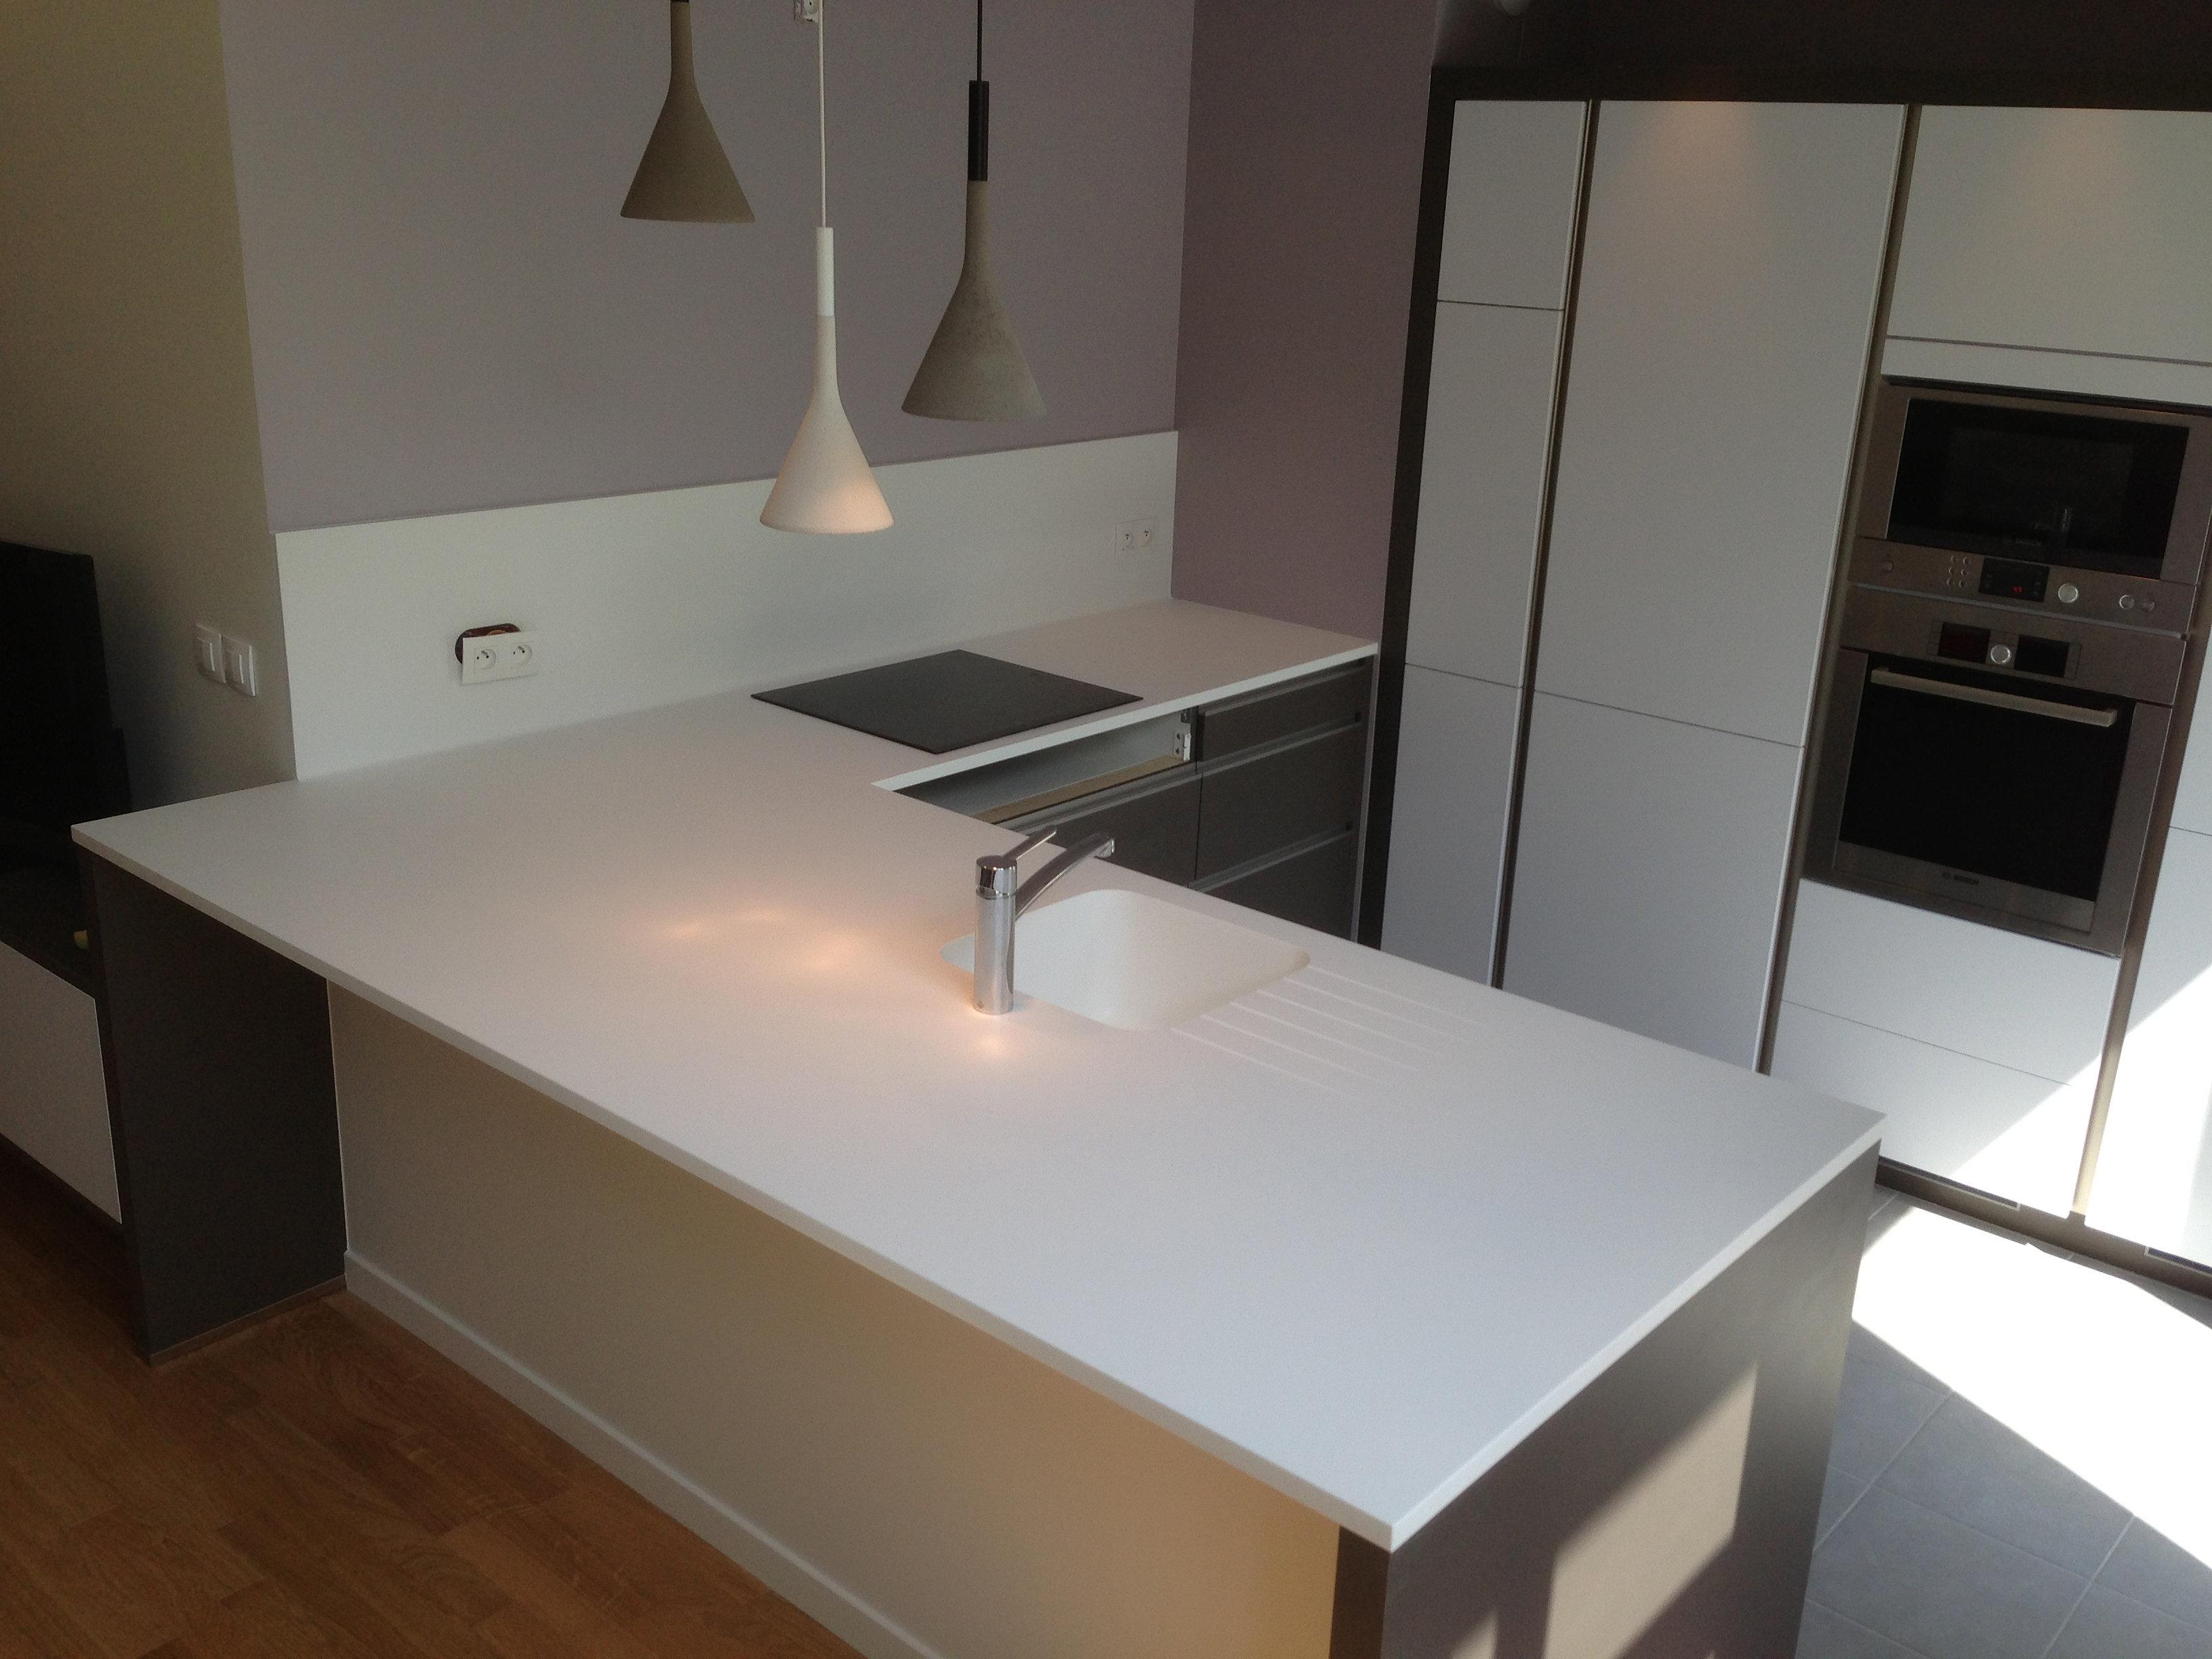 devis plan de travail com paris granit quartz marbre plan de travail en corian. Black Bedroom Furniture Sets. Home Design Ideas